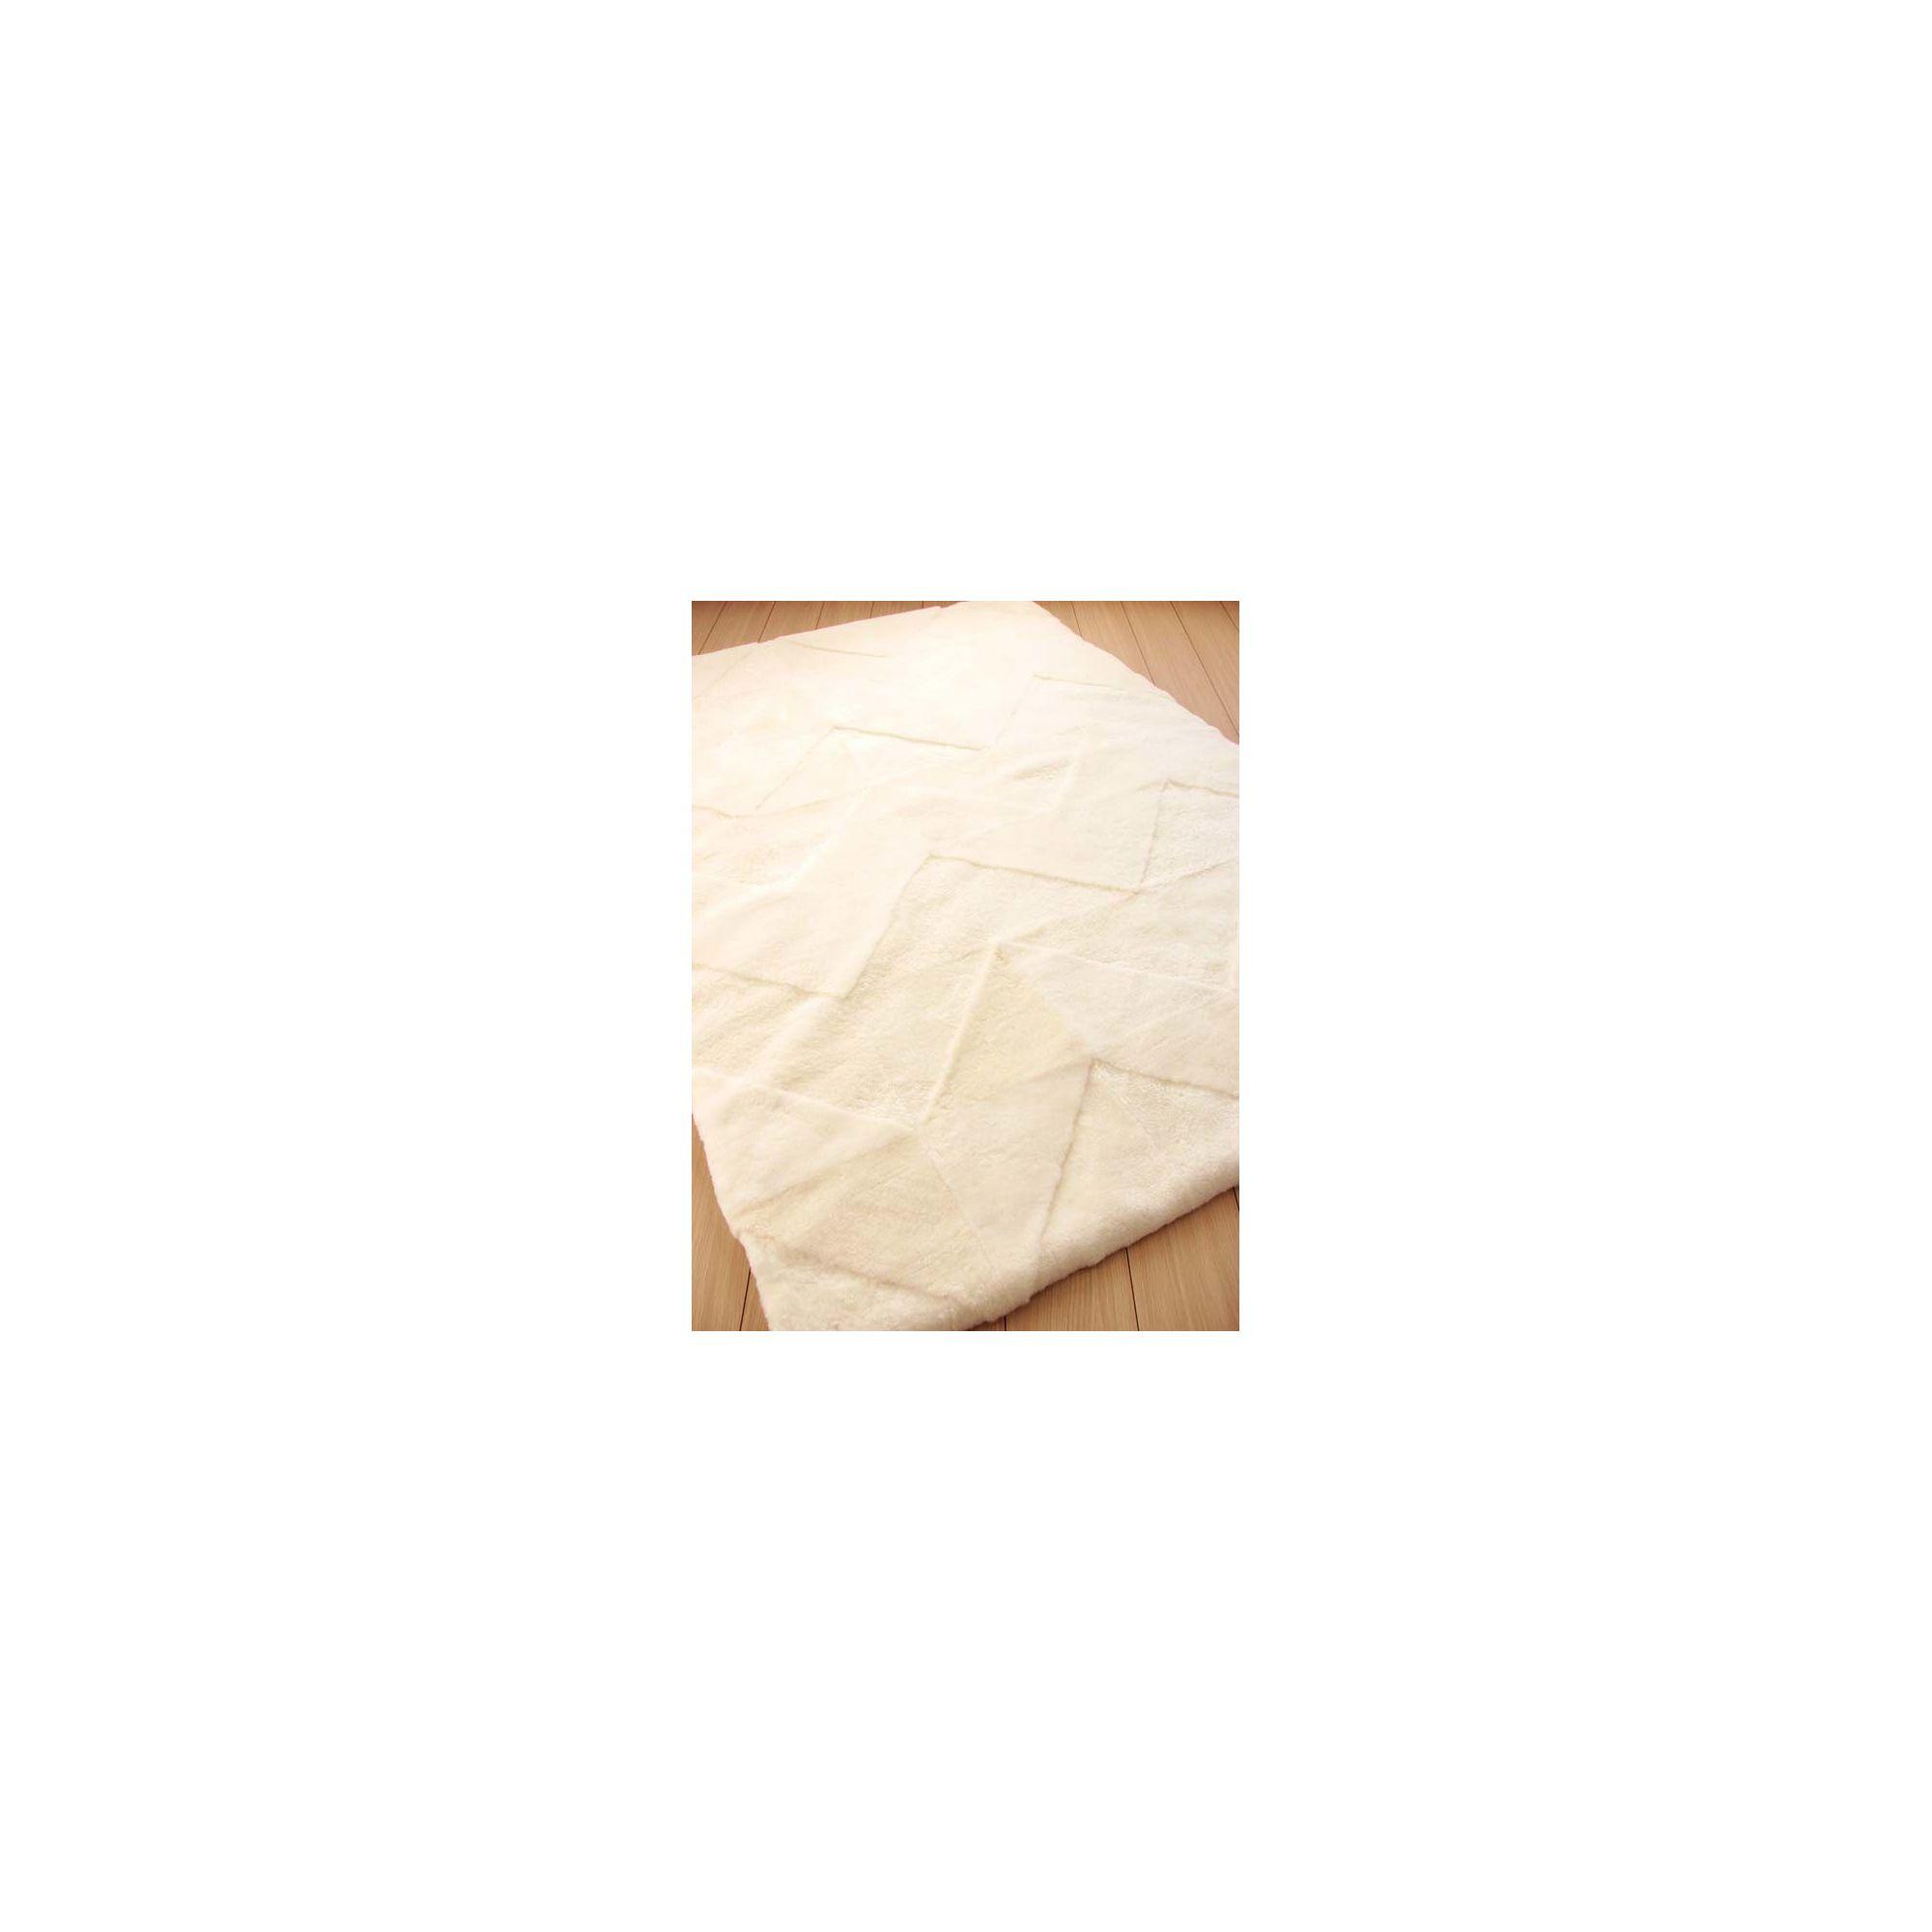 Bowron Sheepskin Shortwool Design Vintage 42 White Rug - 240cm H x 65cm W x 1cm D